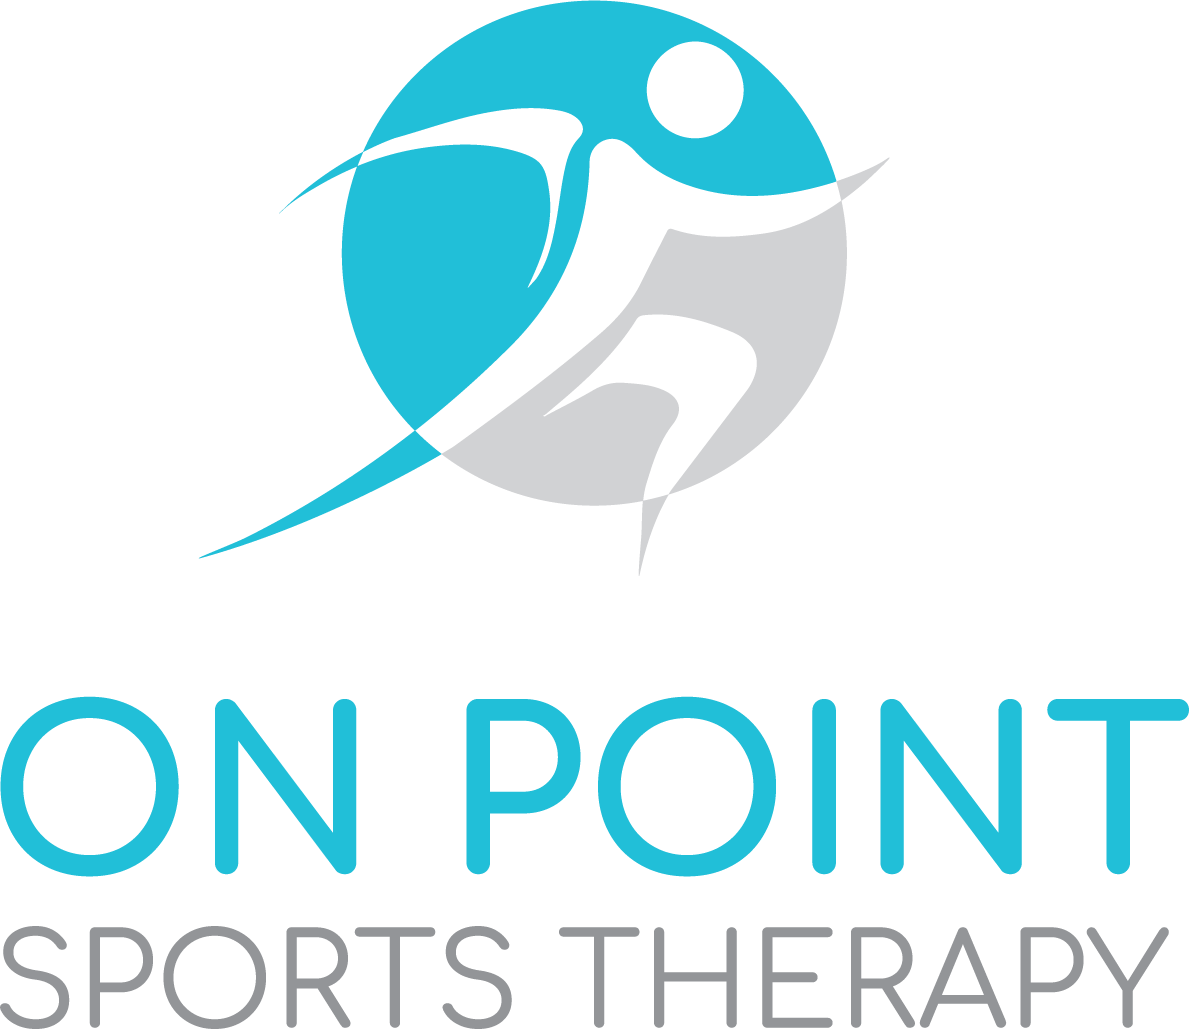 OnPoint_Logo_POS_VERT_2018 - Copy